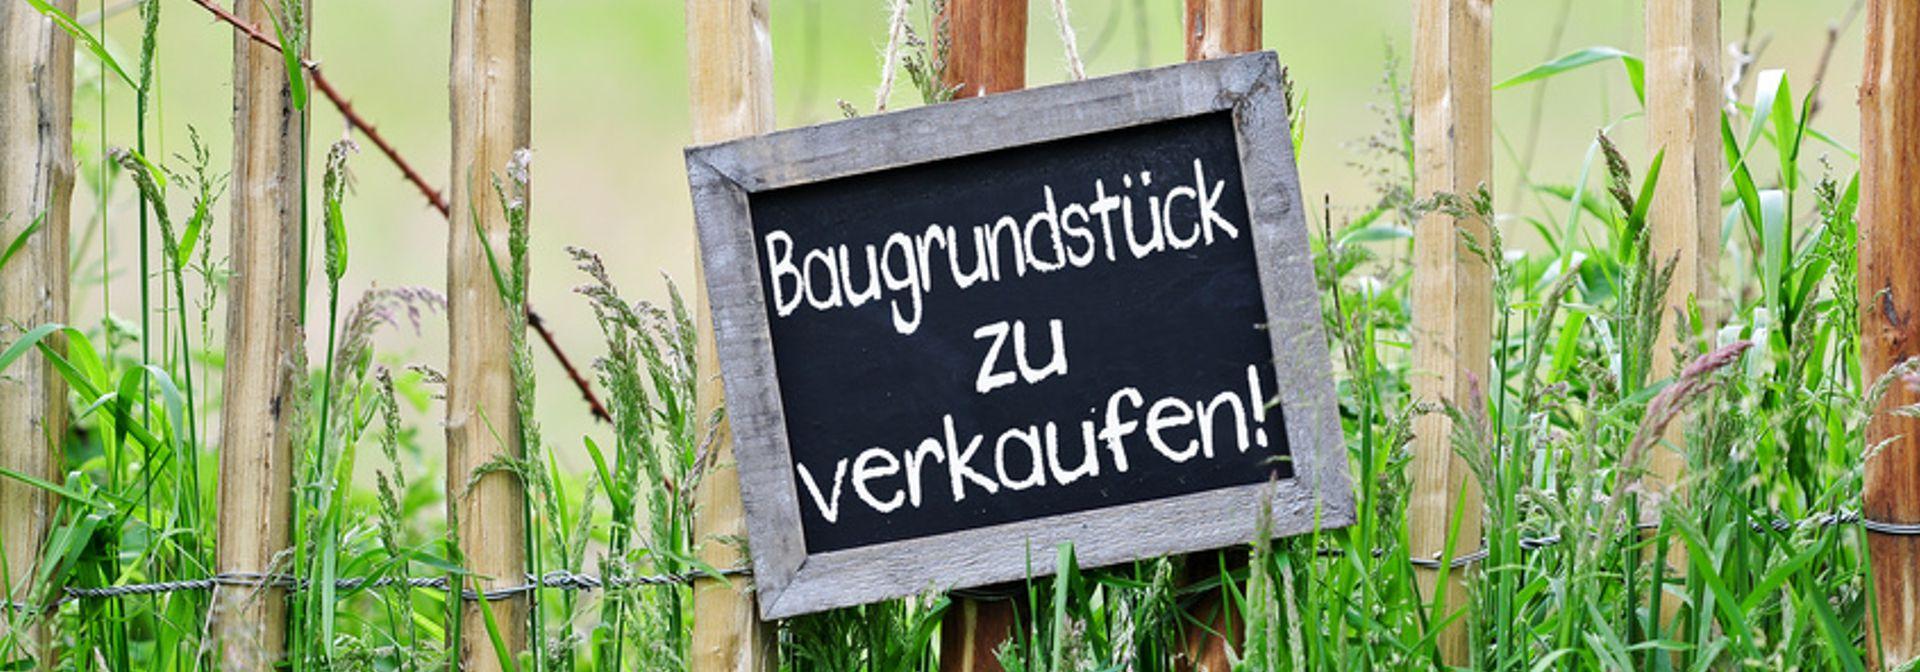 banner-baugrundstueck2